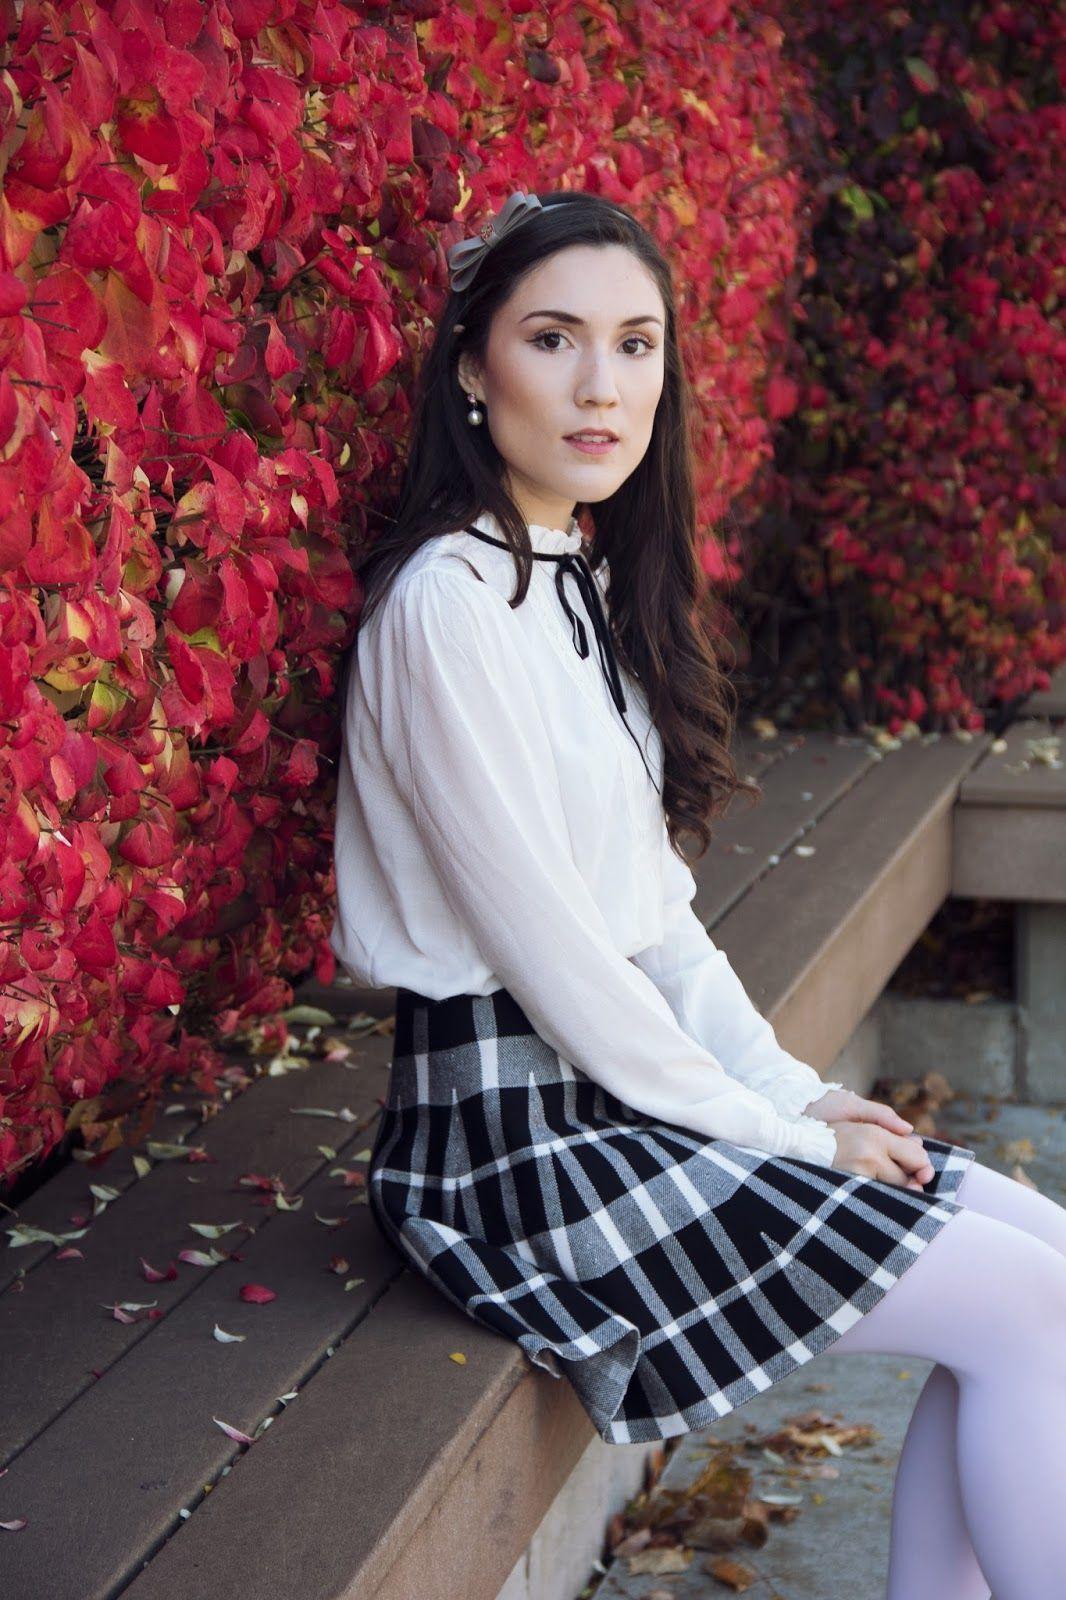 bc69e32695d Toronto Fashion Blogger | white tights in 2019 | White tights ...